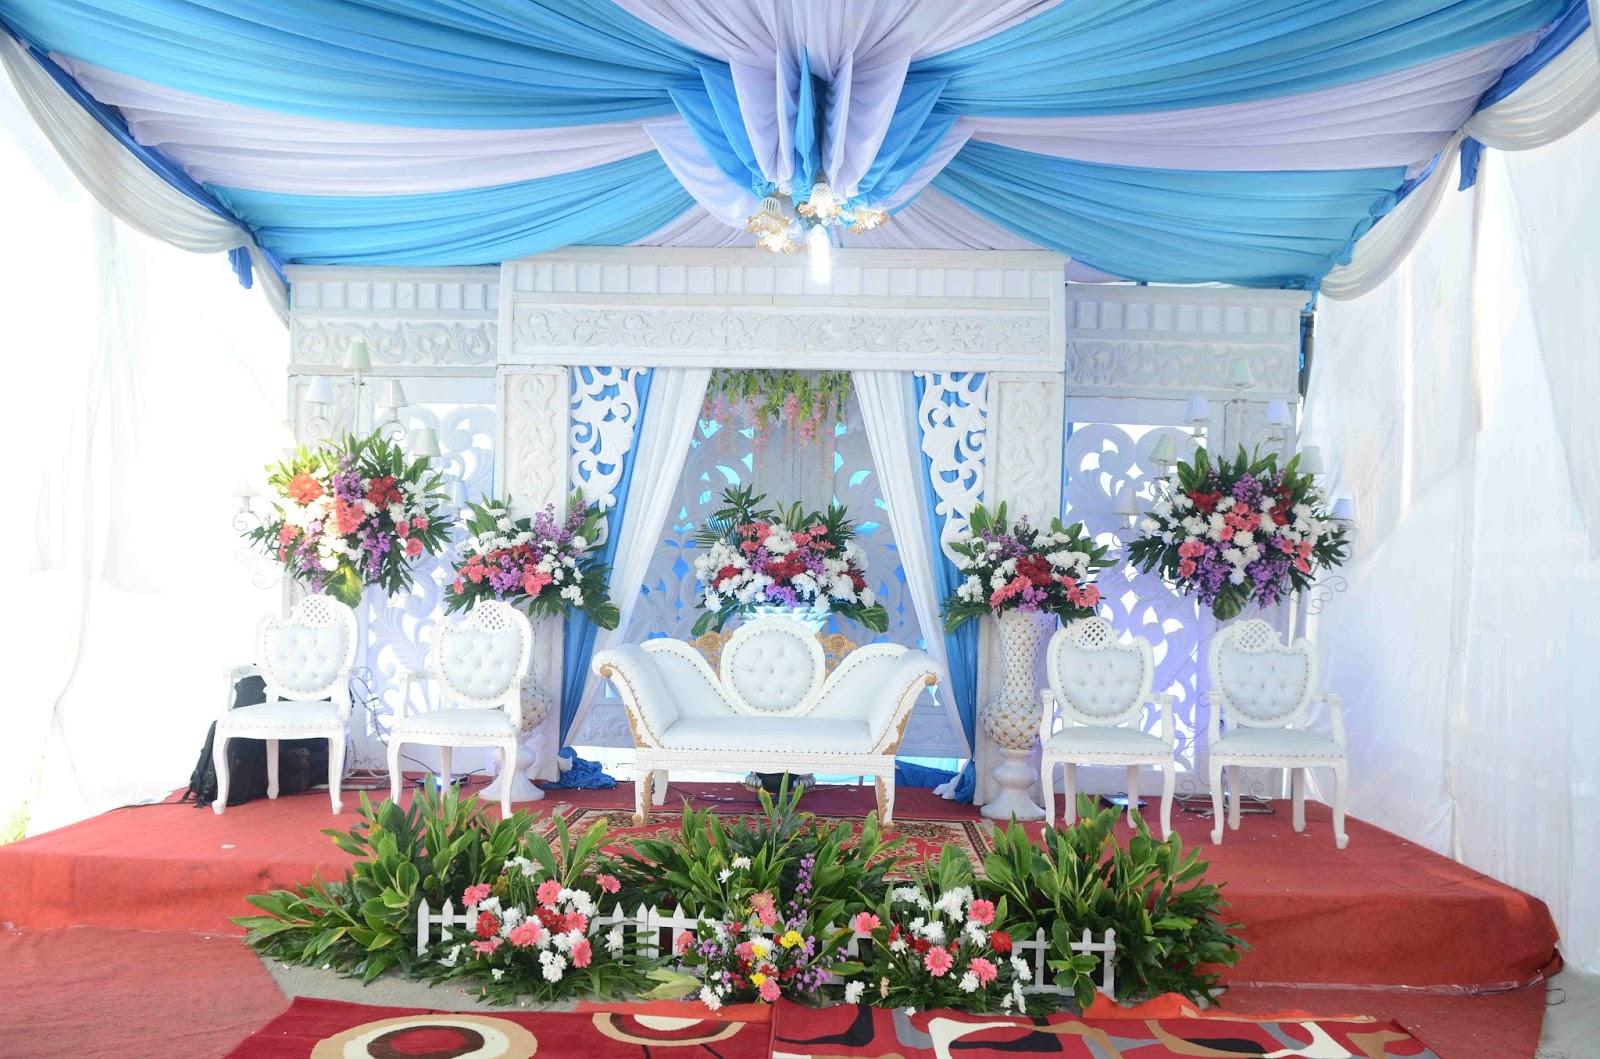 Terbaik Dari Dekorasi Pernikahan Adat Sunda Sederhana